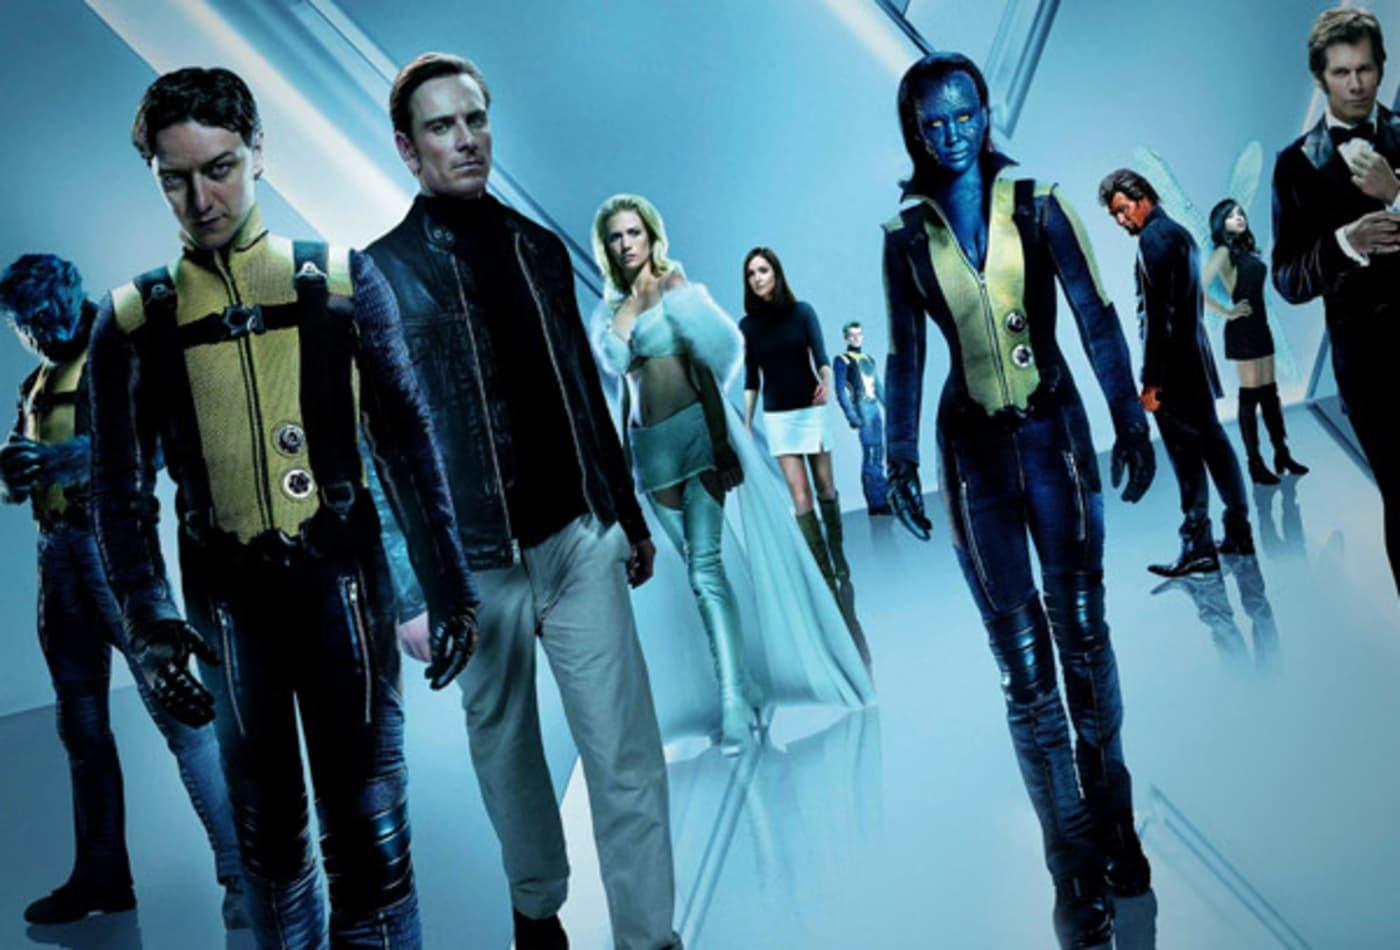 46955357 CNBC_superhero_films_2011_Xmen.jpg